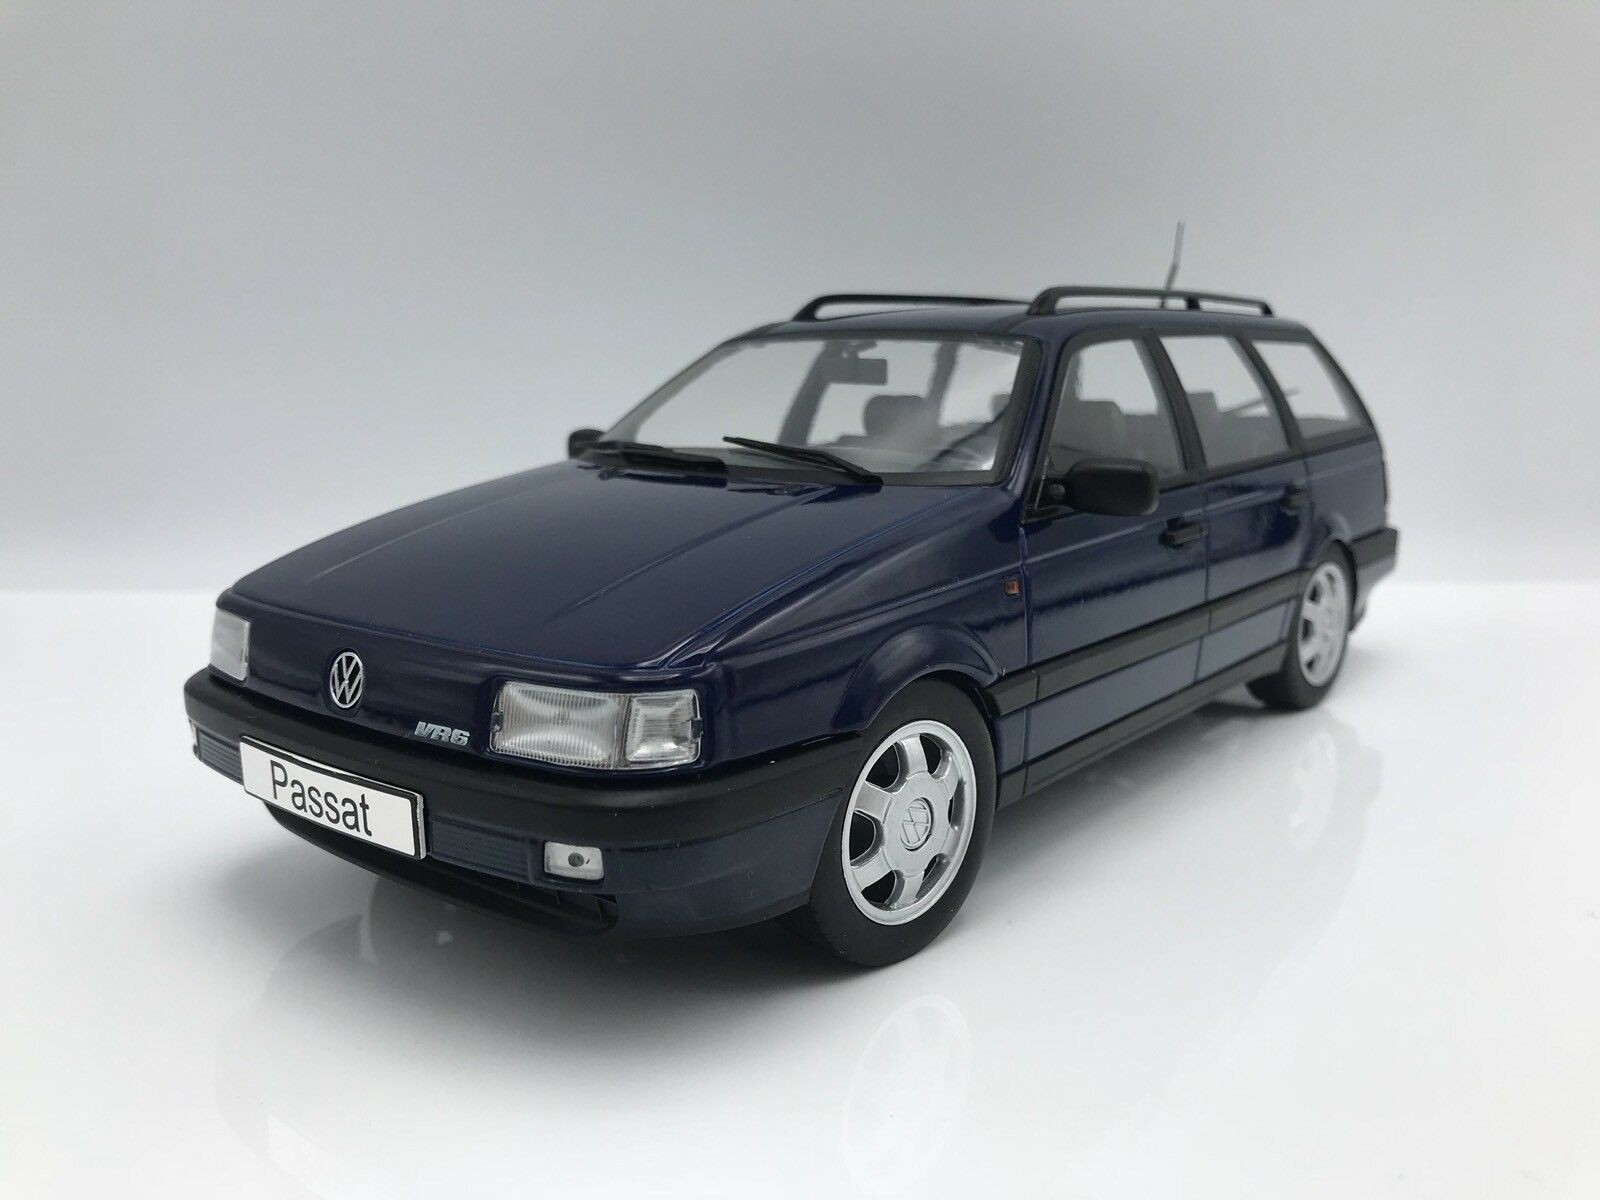 VW Volkswagen passat b3 vr6 VARIANT 1988-metallic-bleu foncé - 1 18 KK-Scale